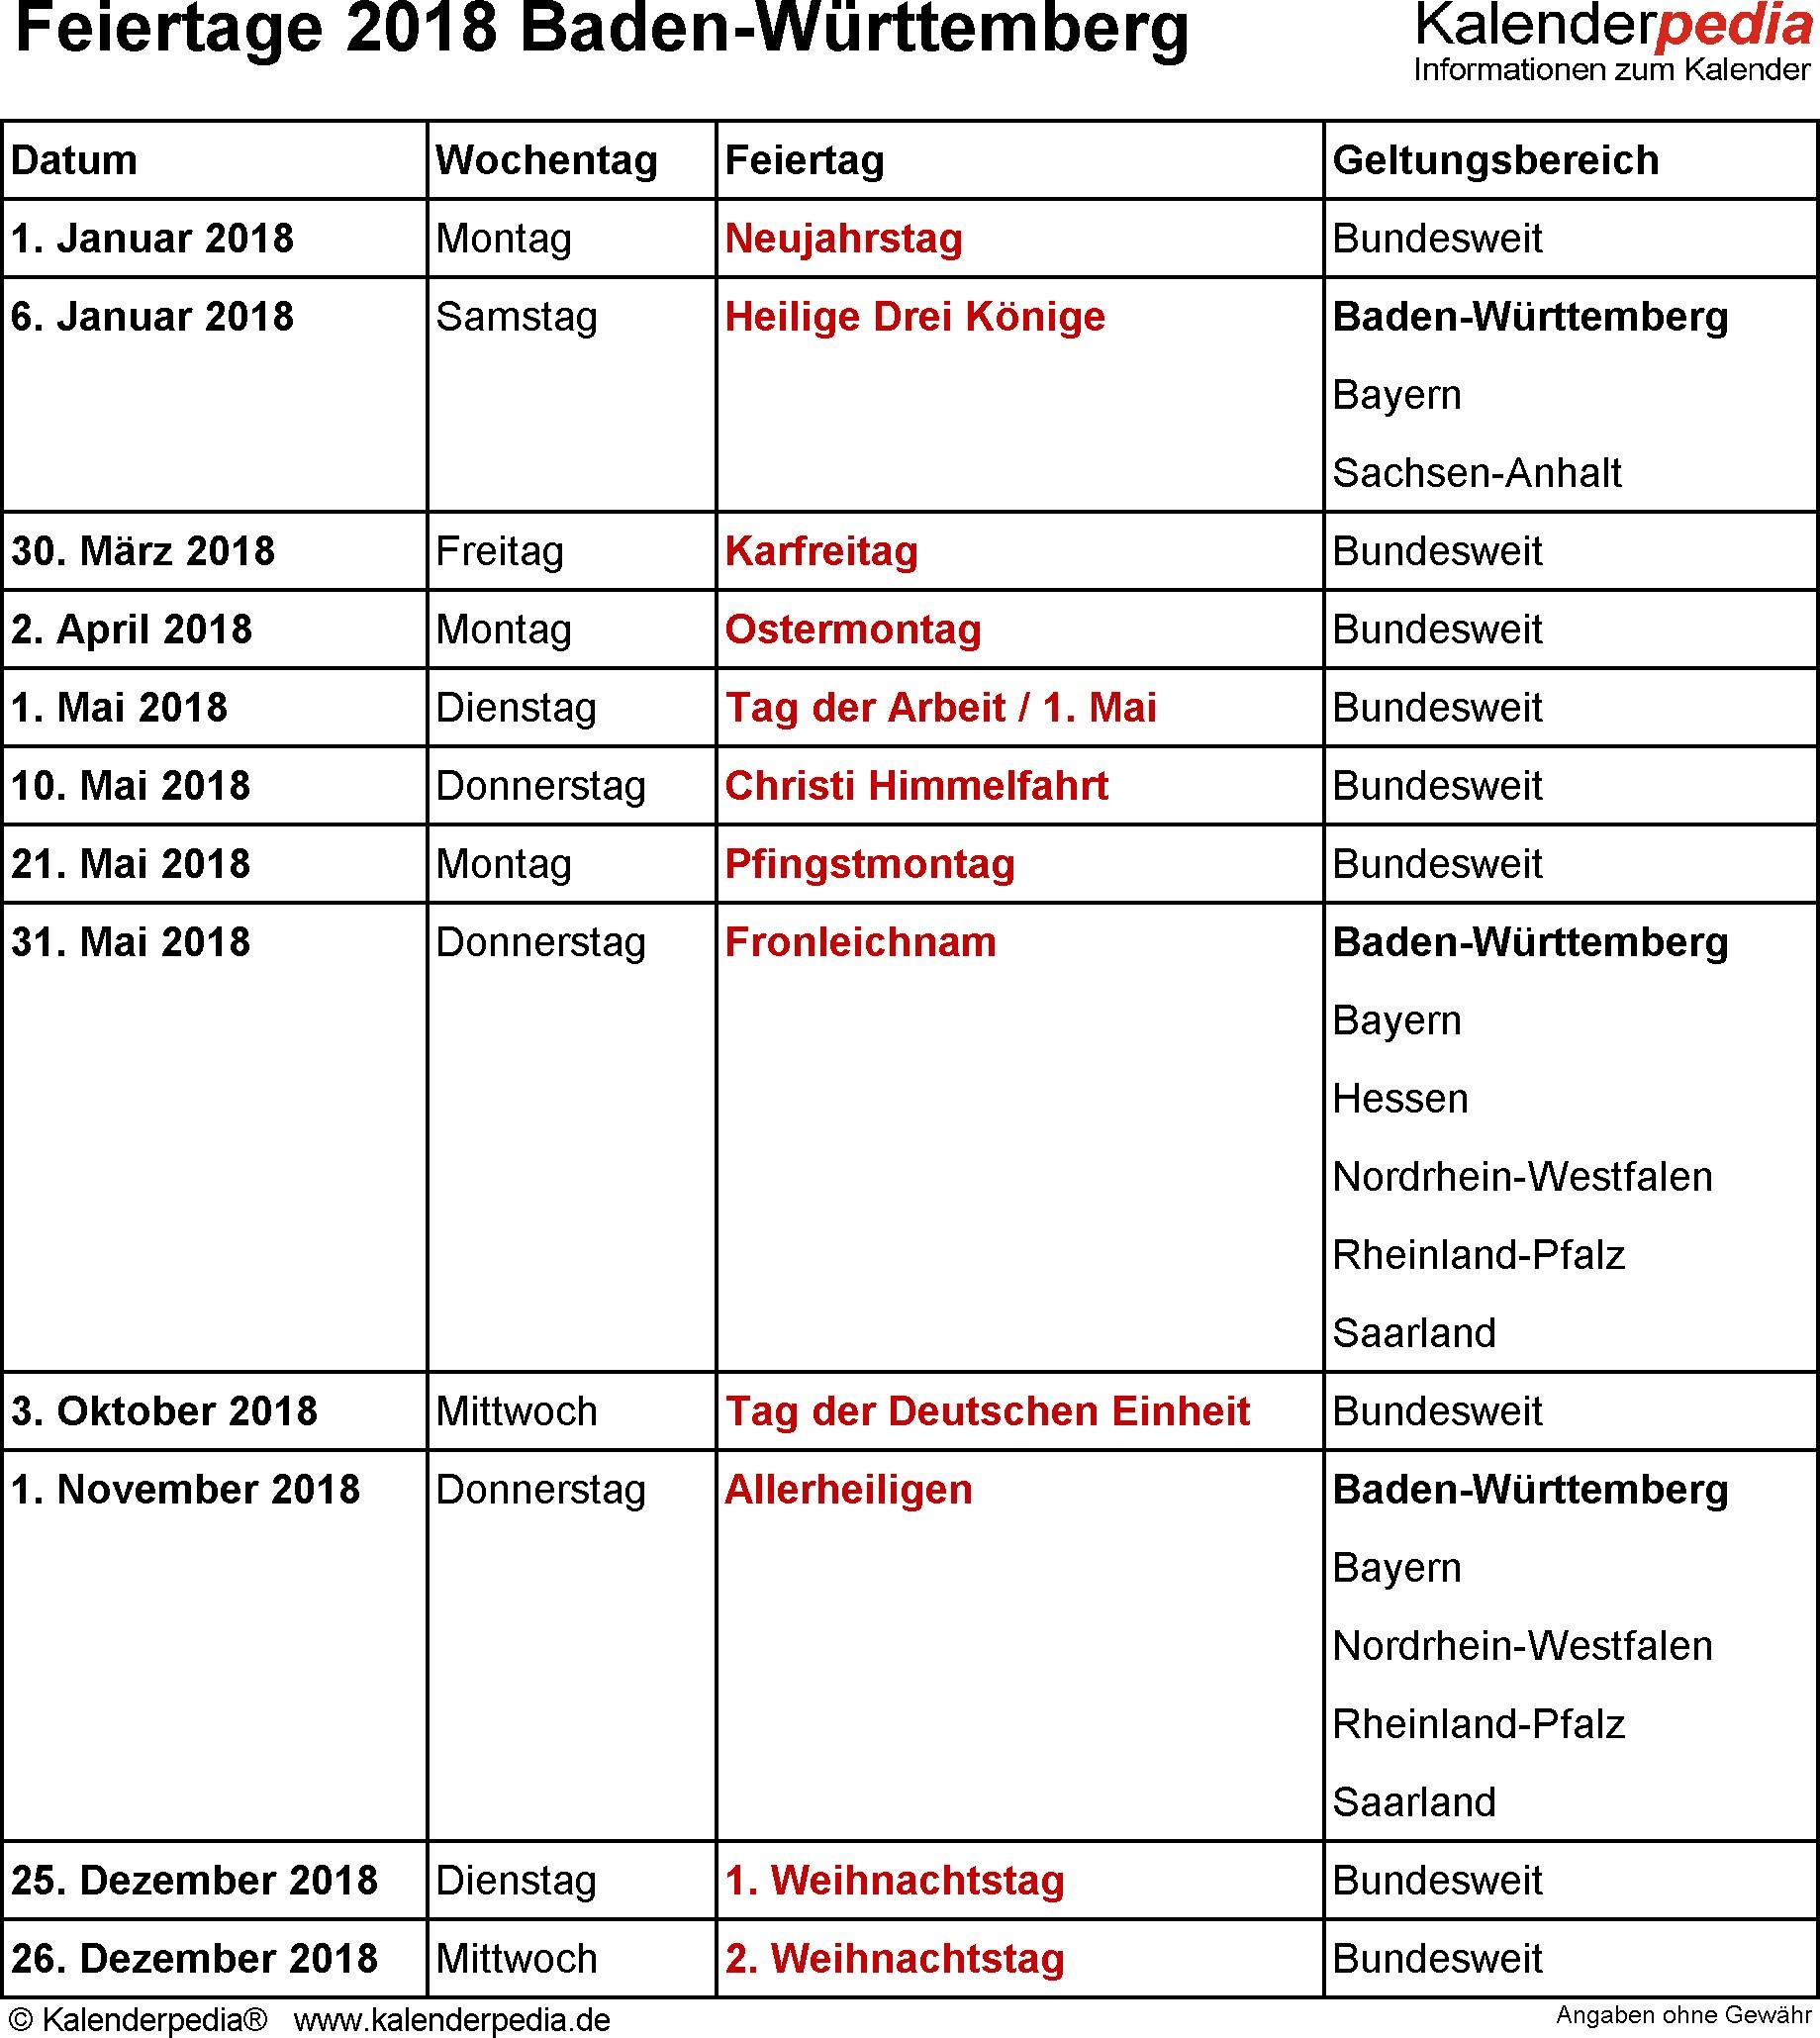 Kalender 2019 Excel Vorlagen Actual Feiertage Baden Württemberg 2018 2019 & 2020 Of Kalender 2019 Excel Vorlagen Actual Microsoft Excel Calendar 2014 Template Unique Projektplan Excel